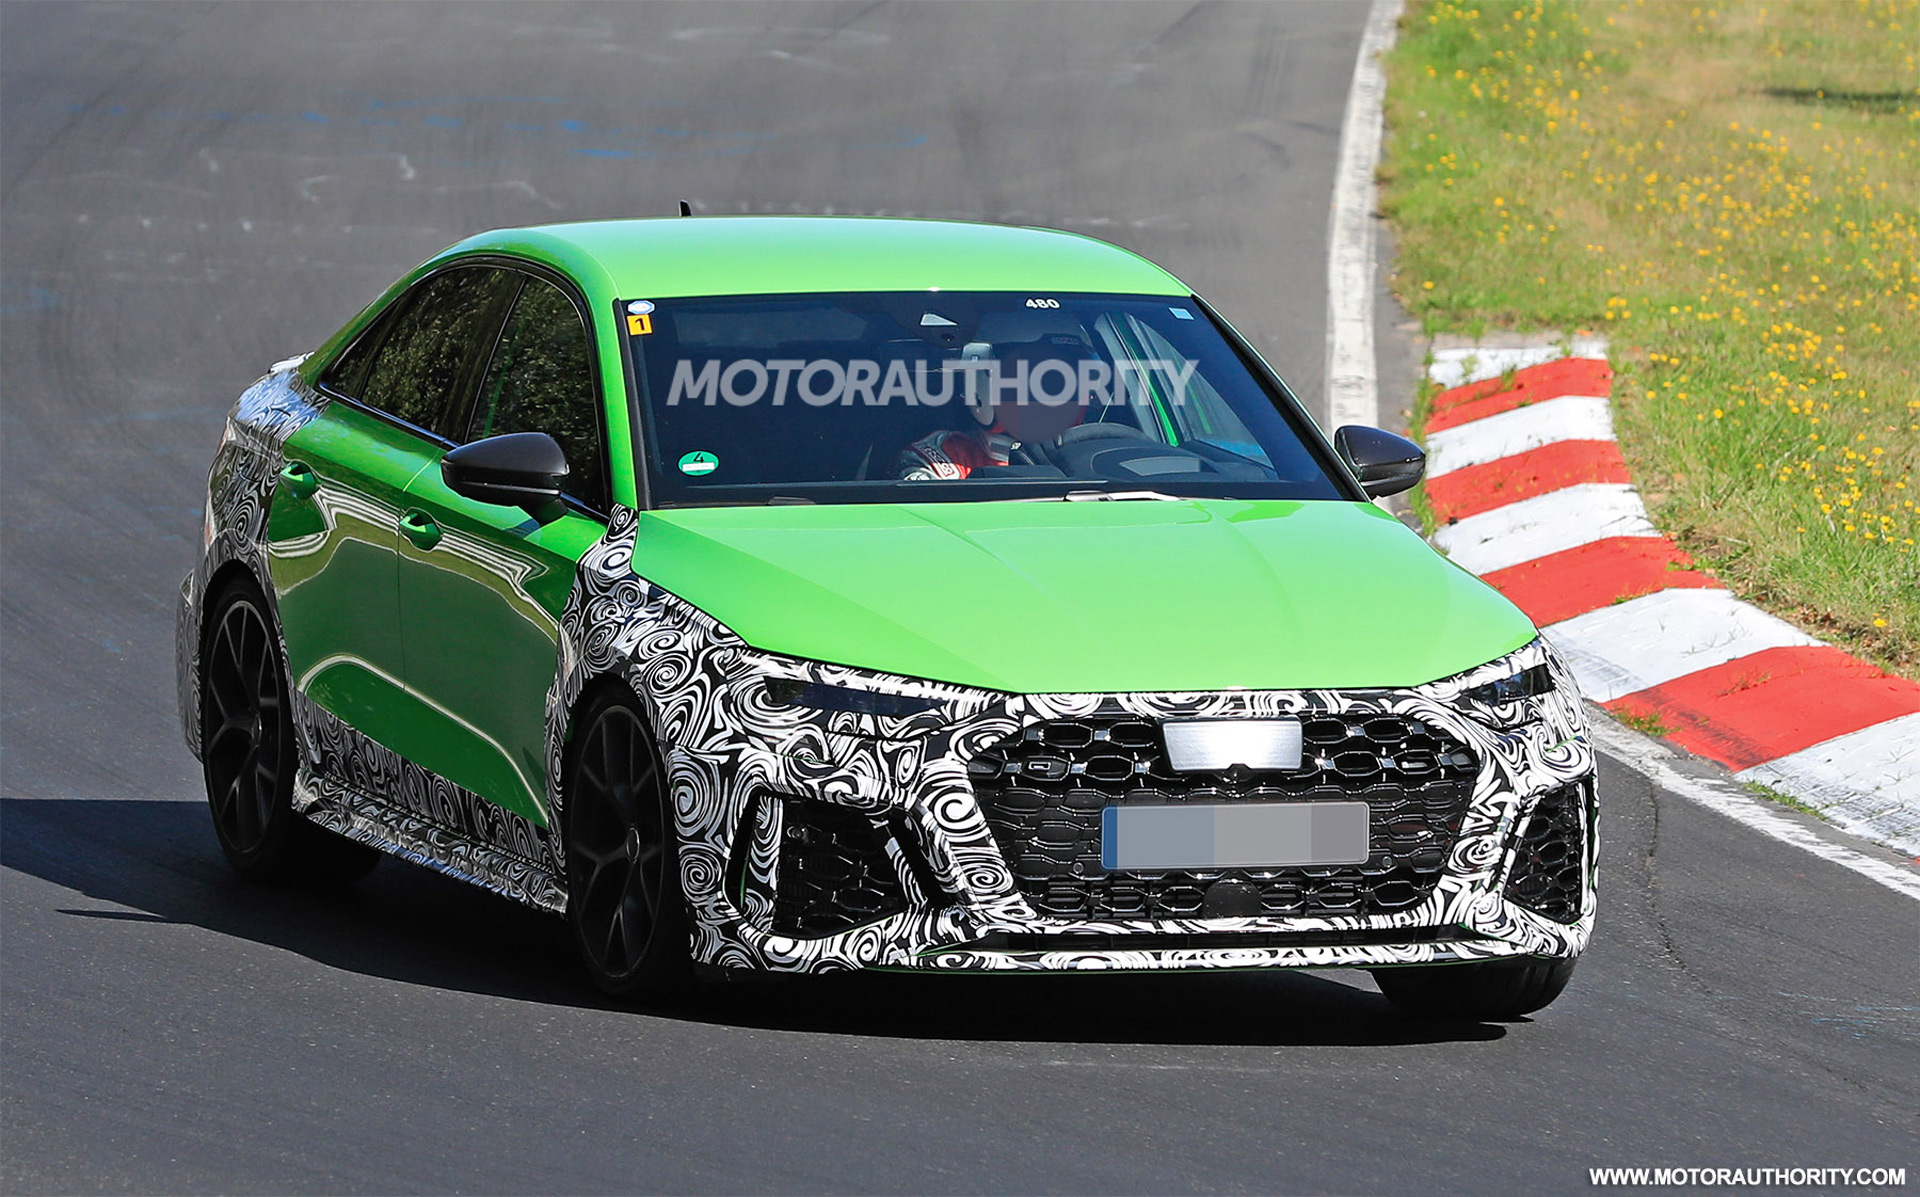 2022 Audi RS 3 spy shots: 400-plus-horsepower compact sedan coming